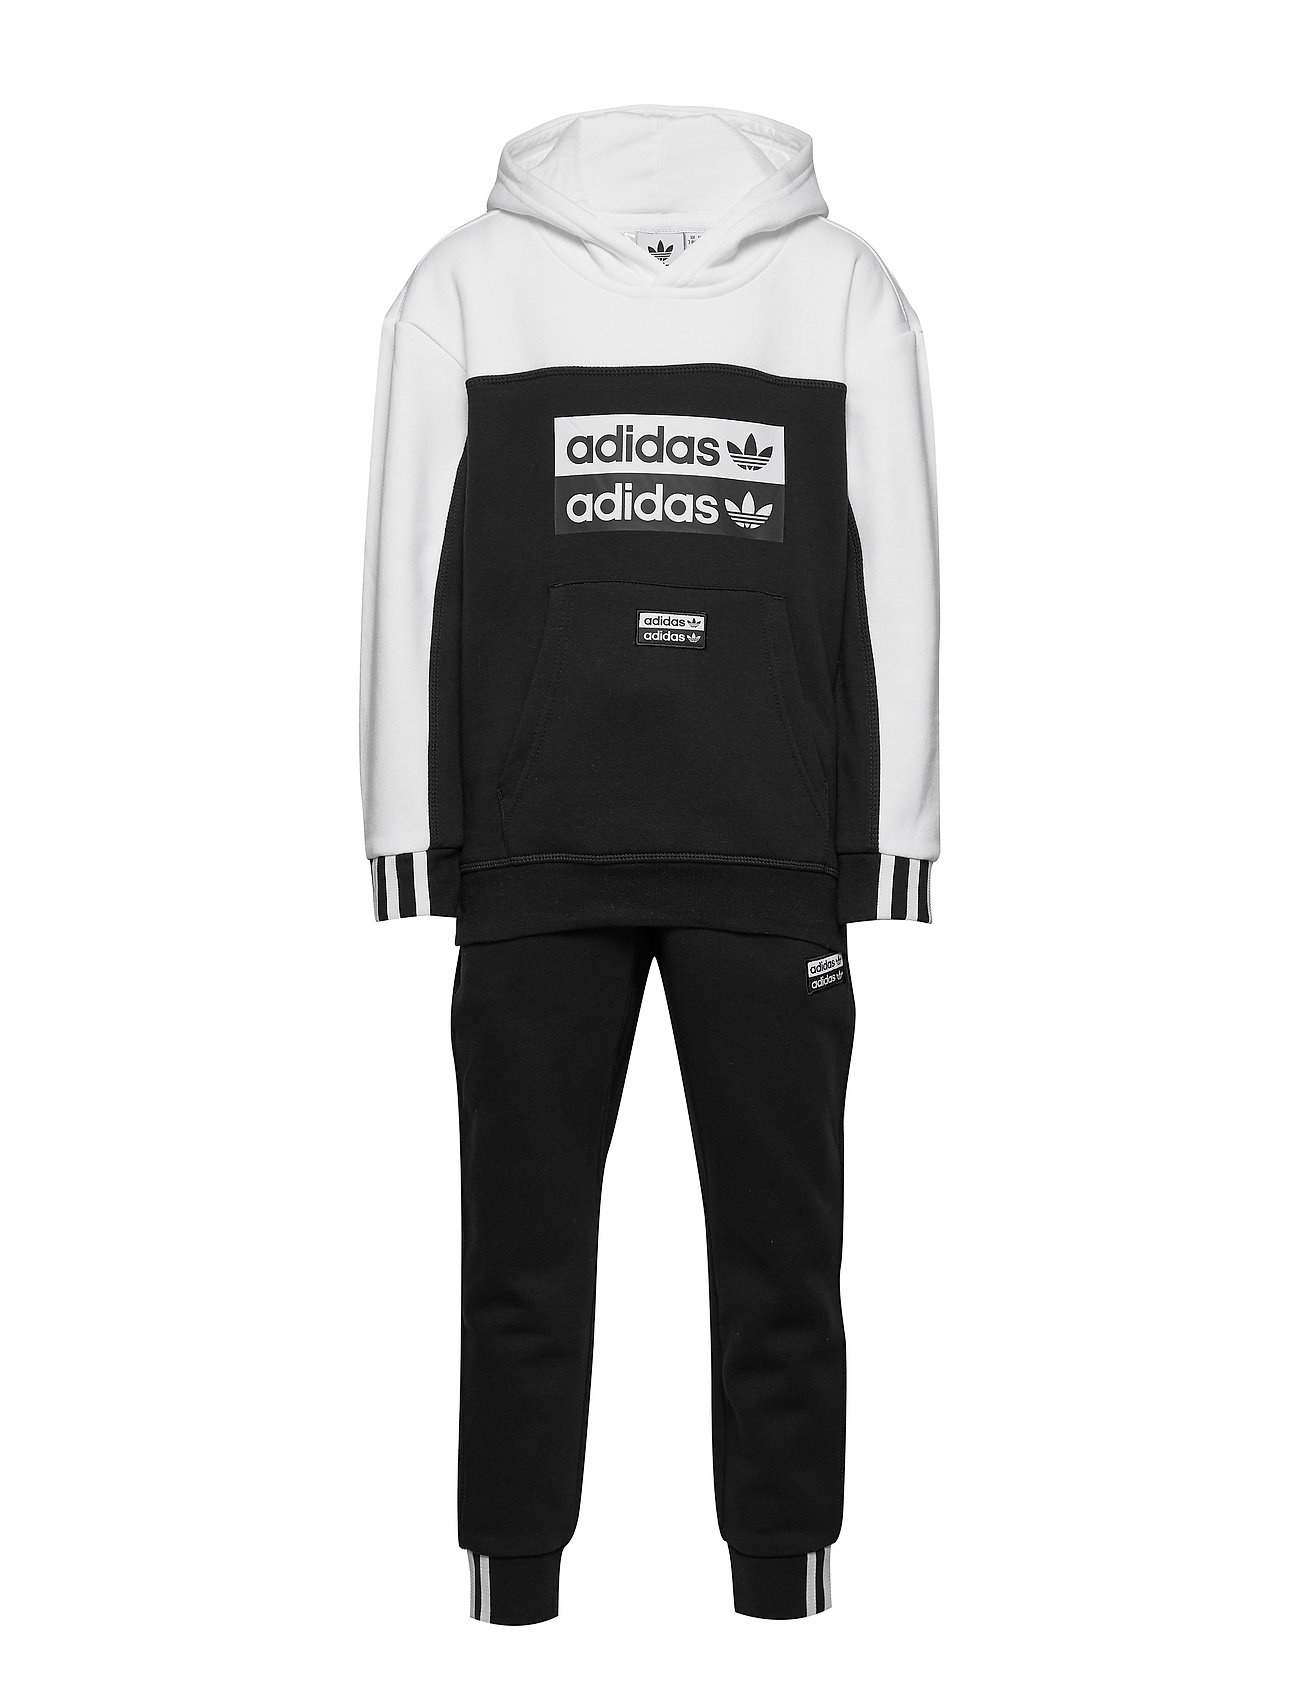 adidas Originals HOODIE SET - BLACK/WHITE